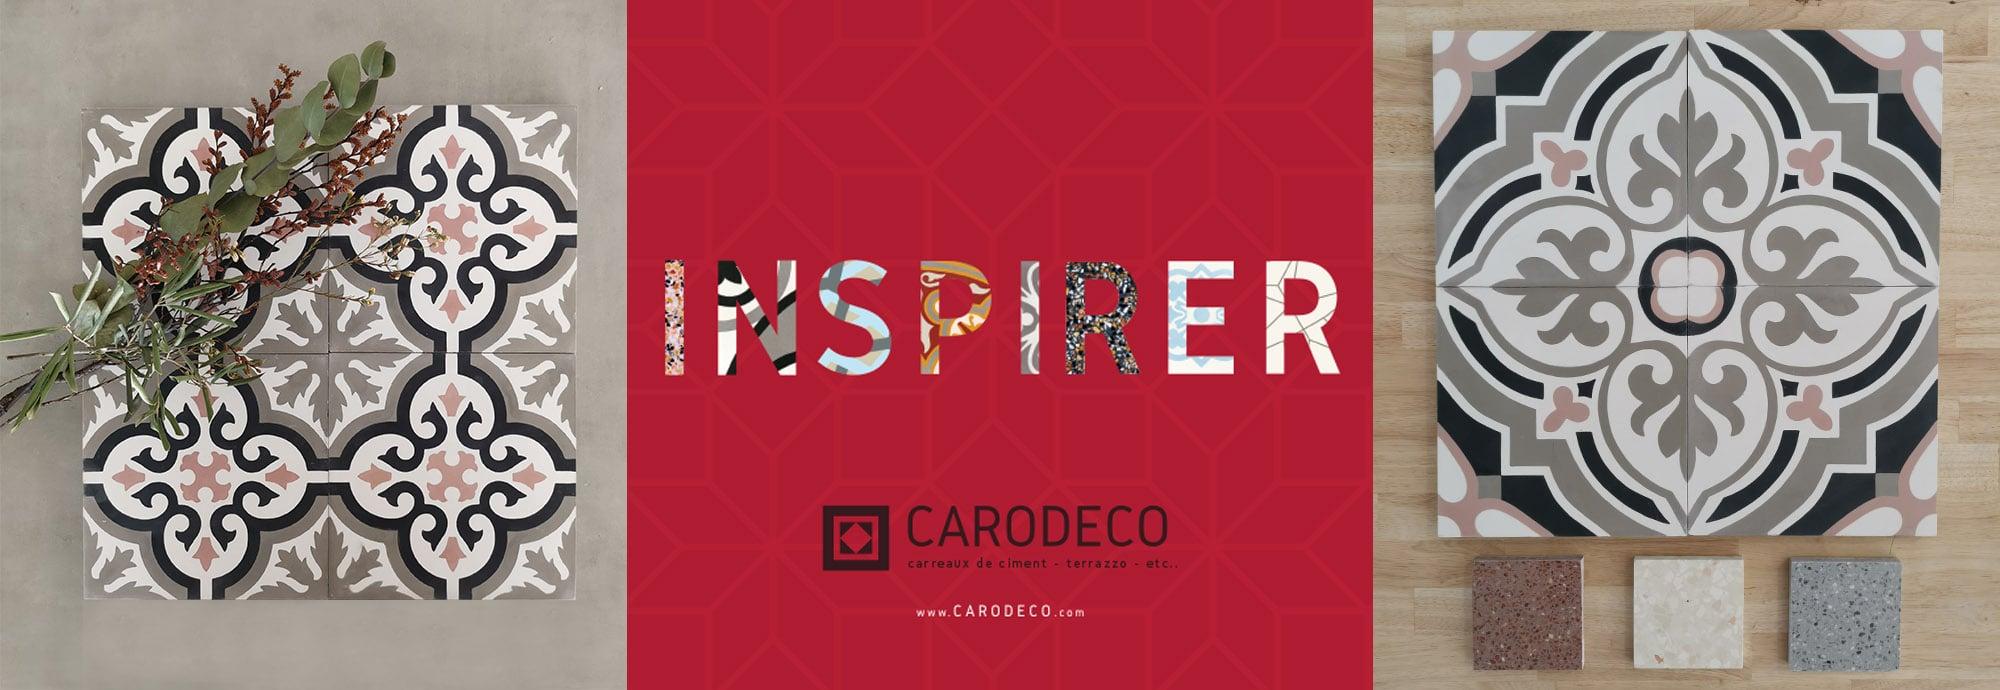 carodeco-9